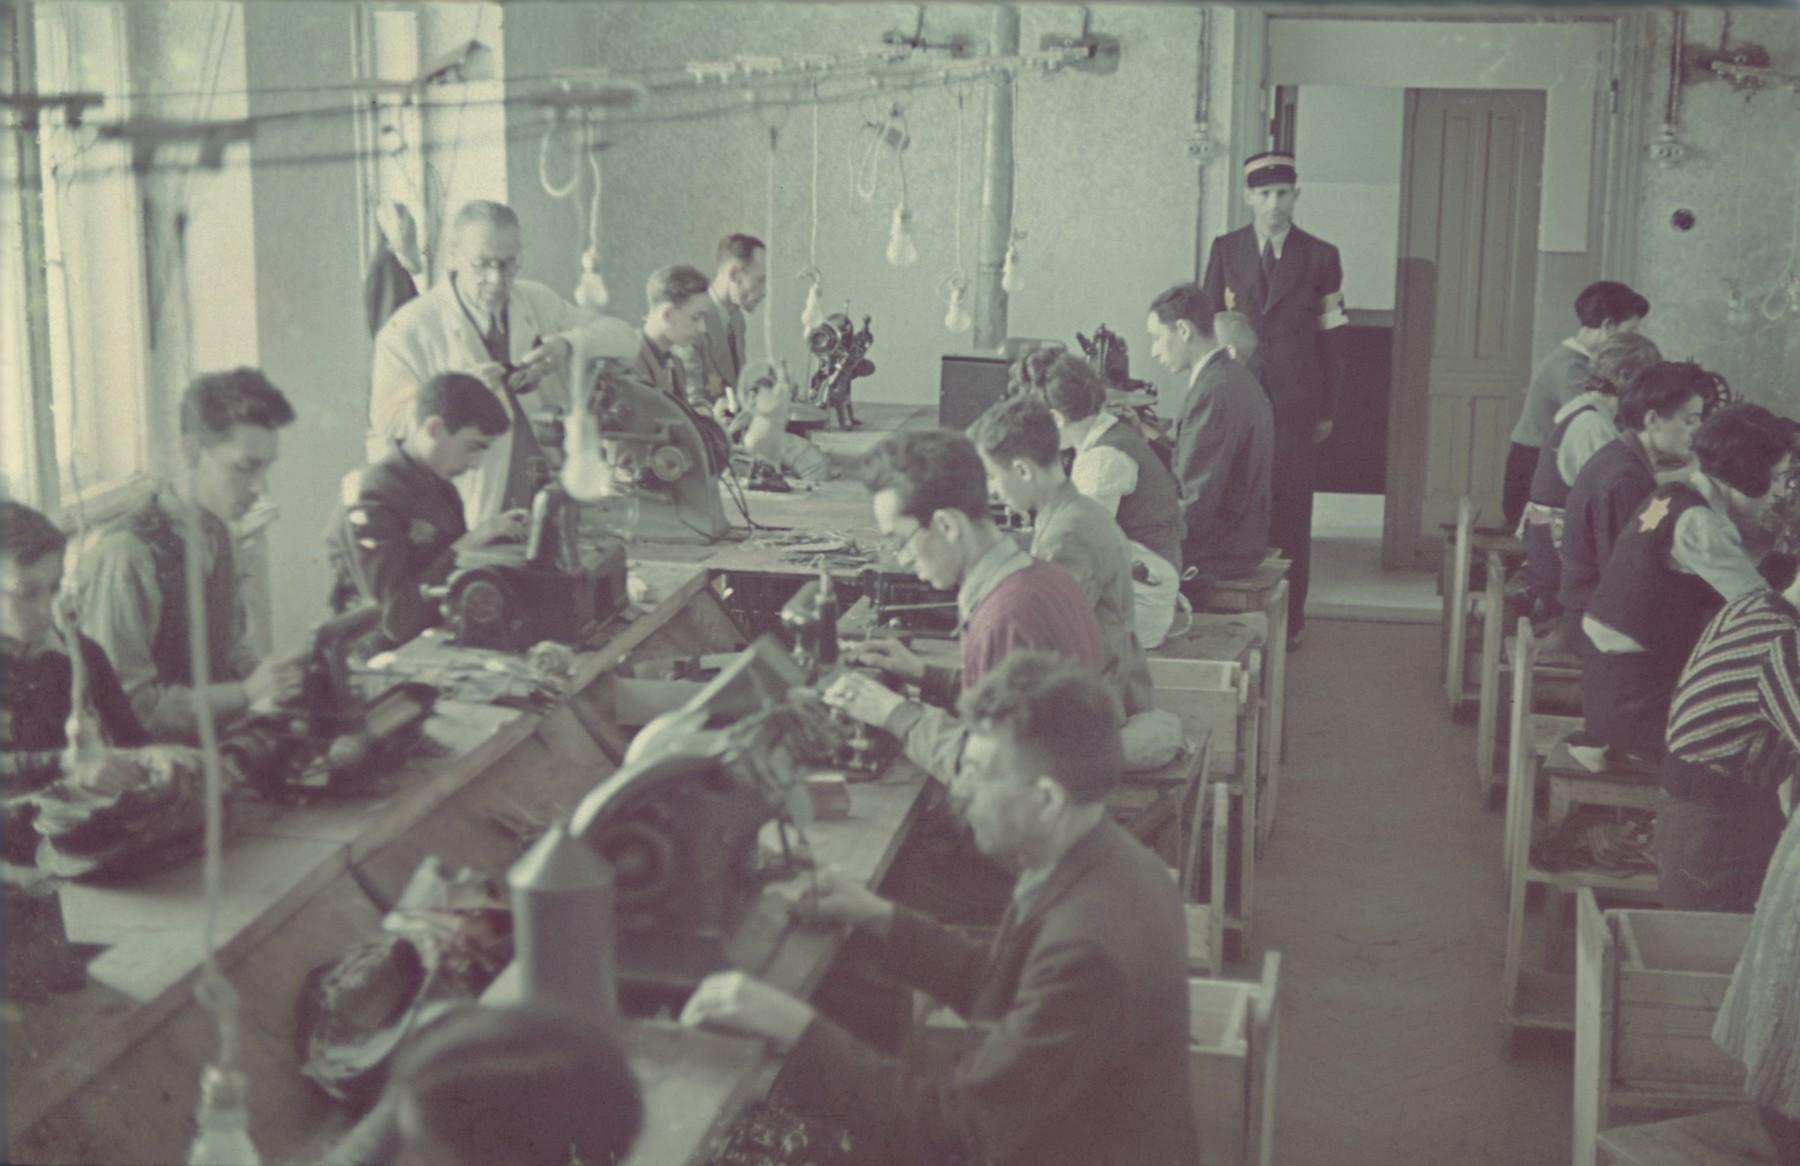 "Workers in the saddle-making workshop in the Lodz ghetto.  Original German caption: ""Litzmannstadt-Getto, Sattlerei"" (saddlery)."